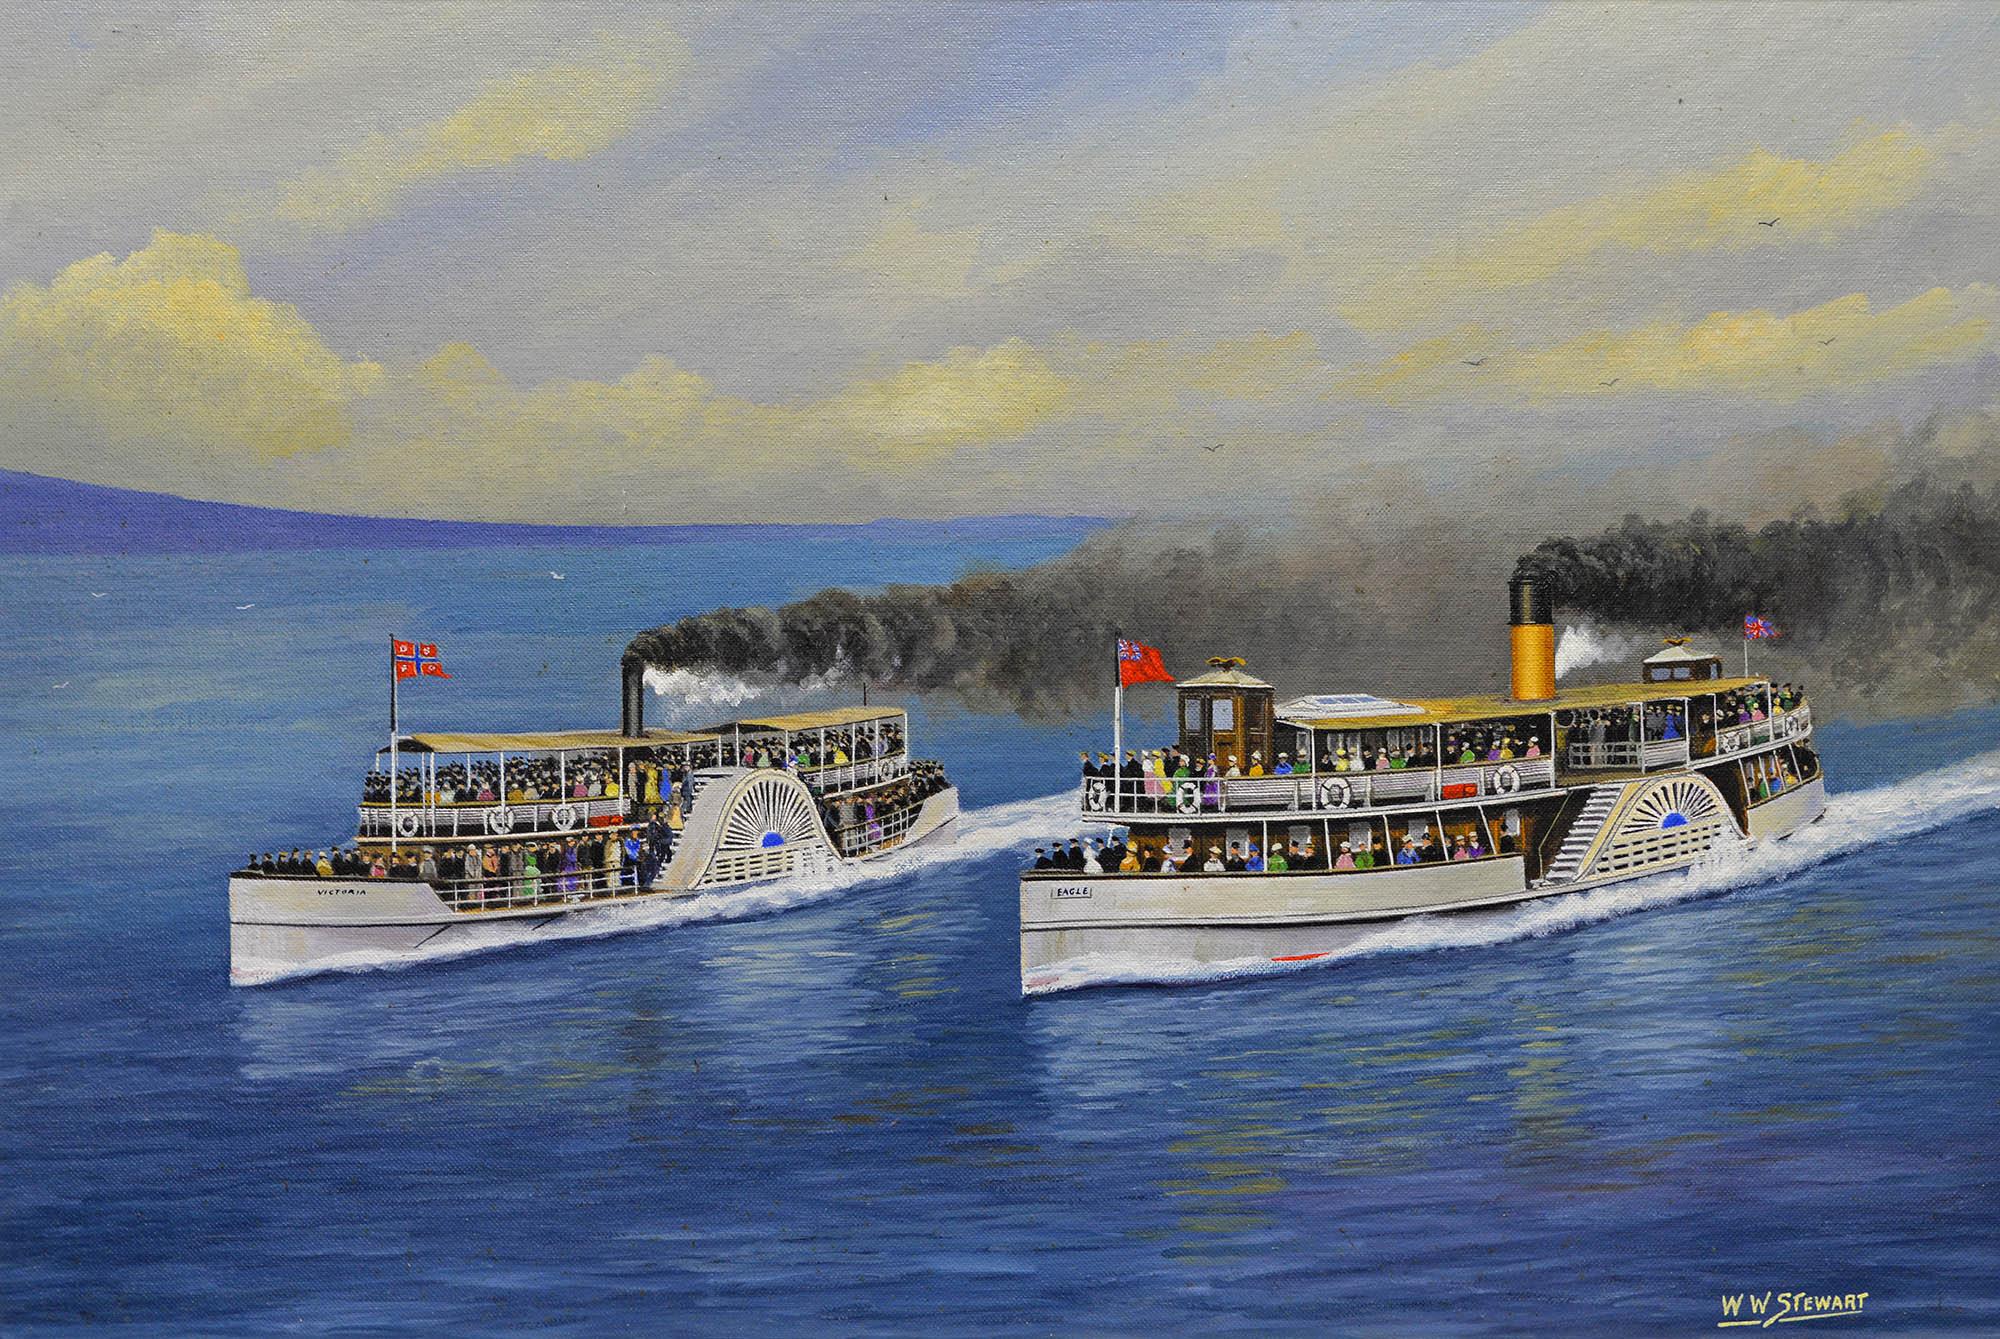 https://rfacdn.nz/maritime/assets/media/ferries-on-the-waitemata-edmiston-archive.jpg